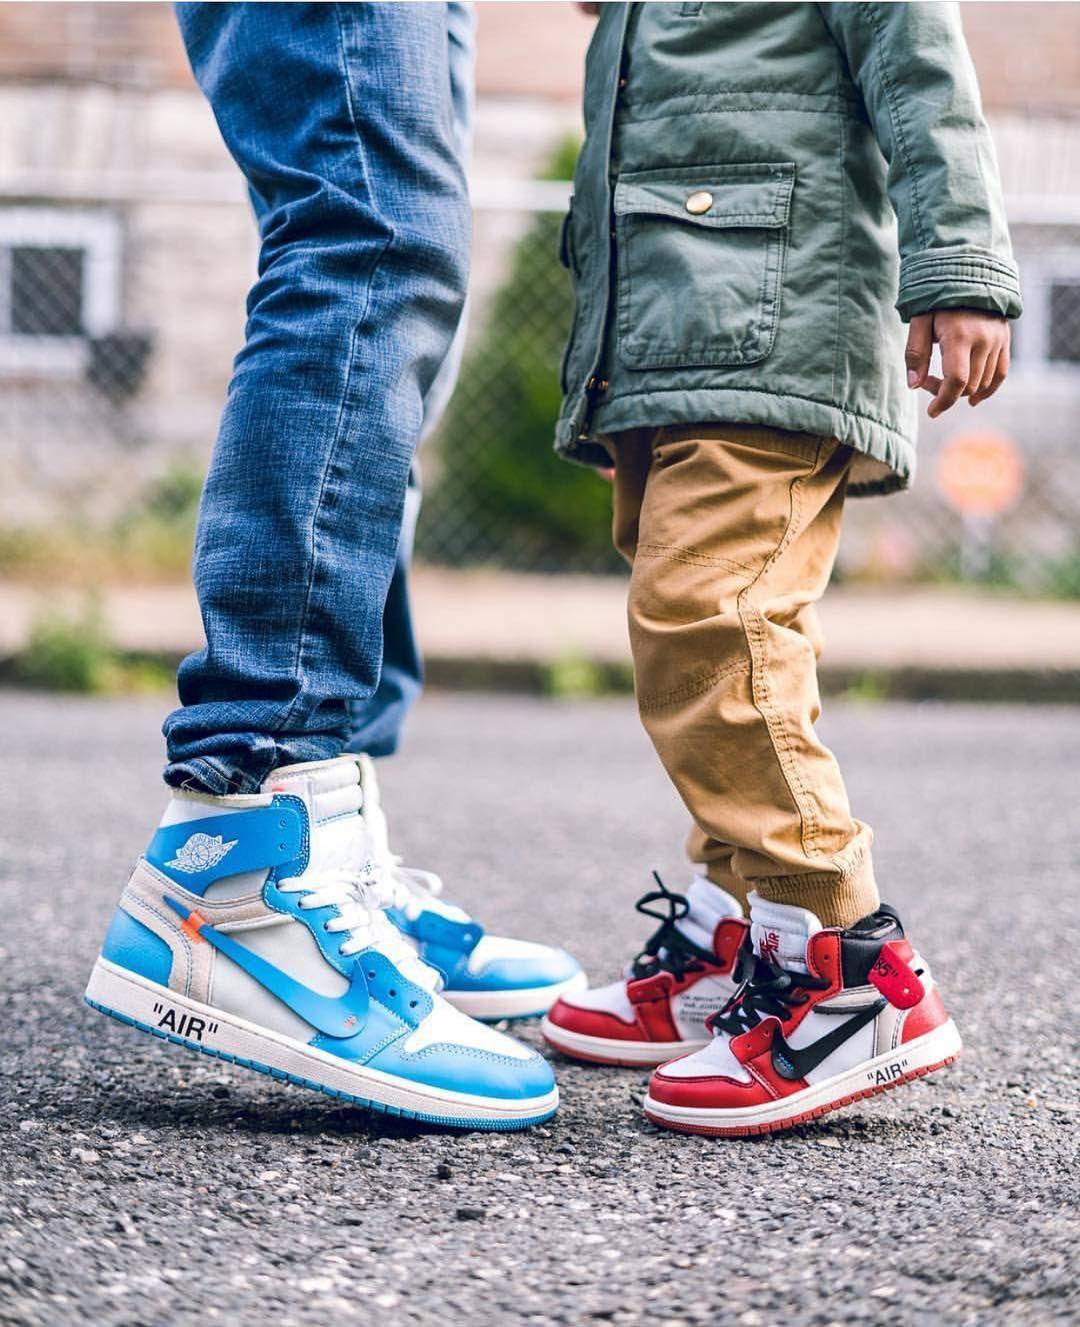 quality design 68ed7 71a46 off-white Jordan 1s | Look Book | Kid shoes, Kids fashion ...